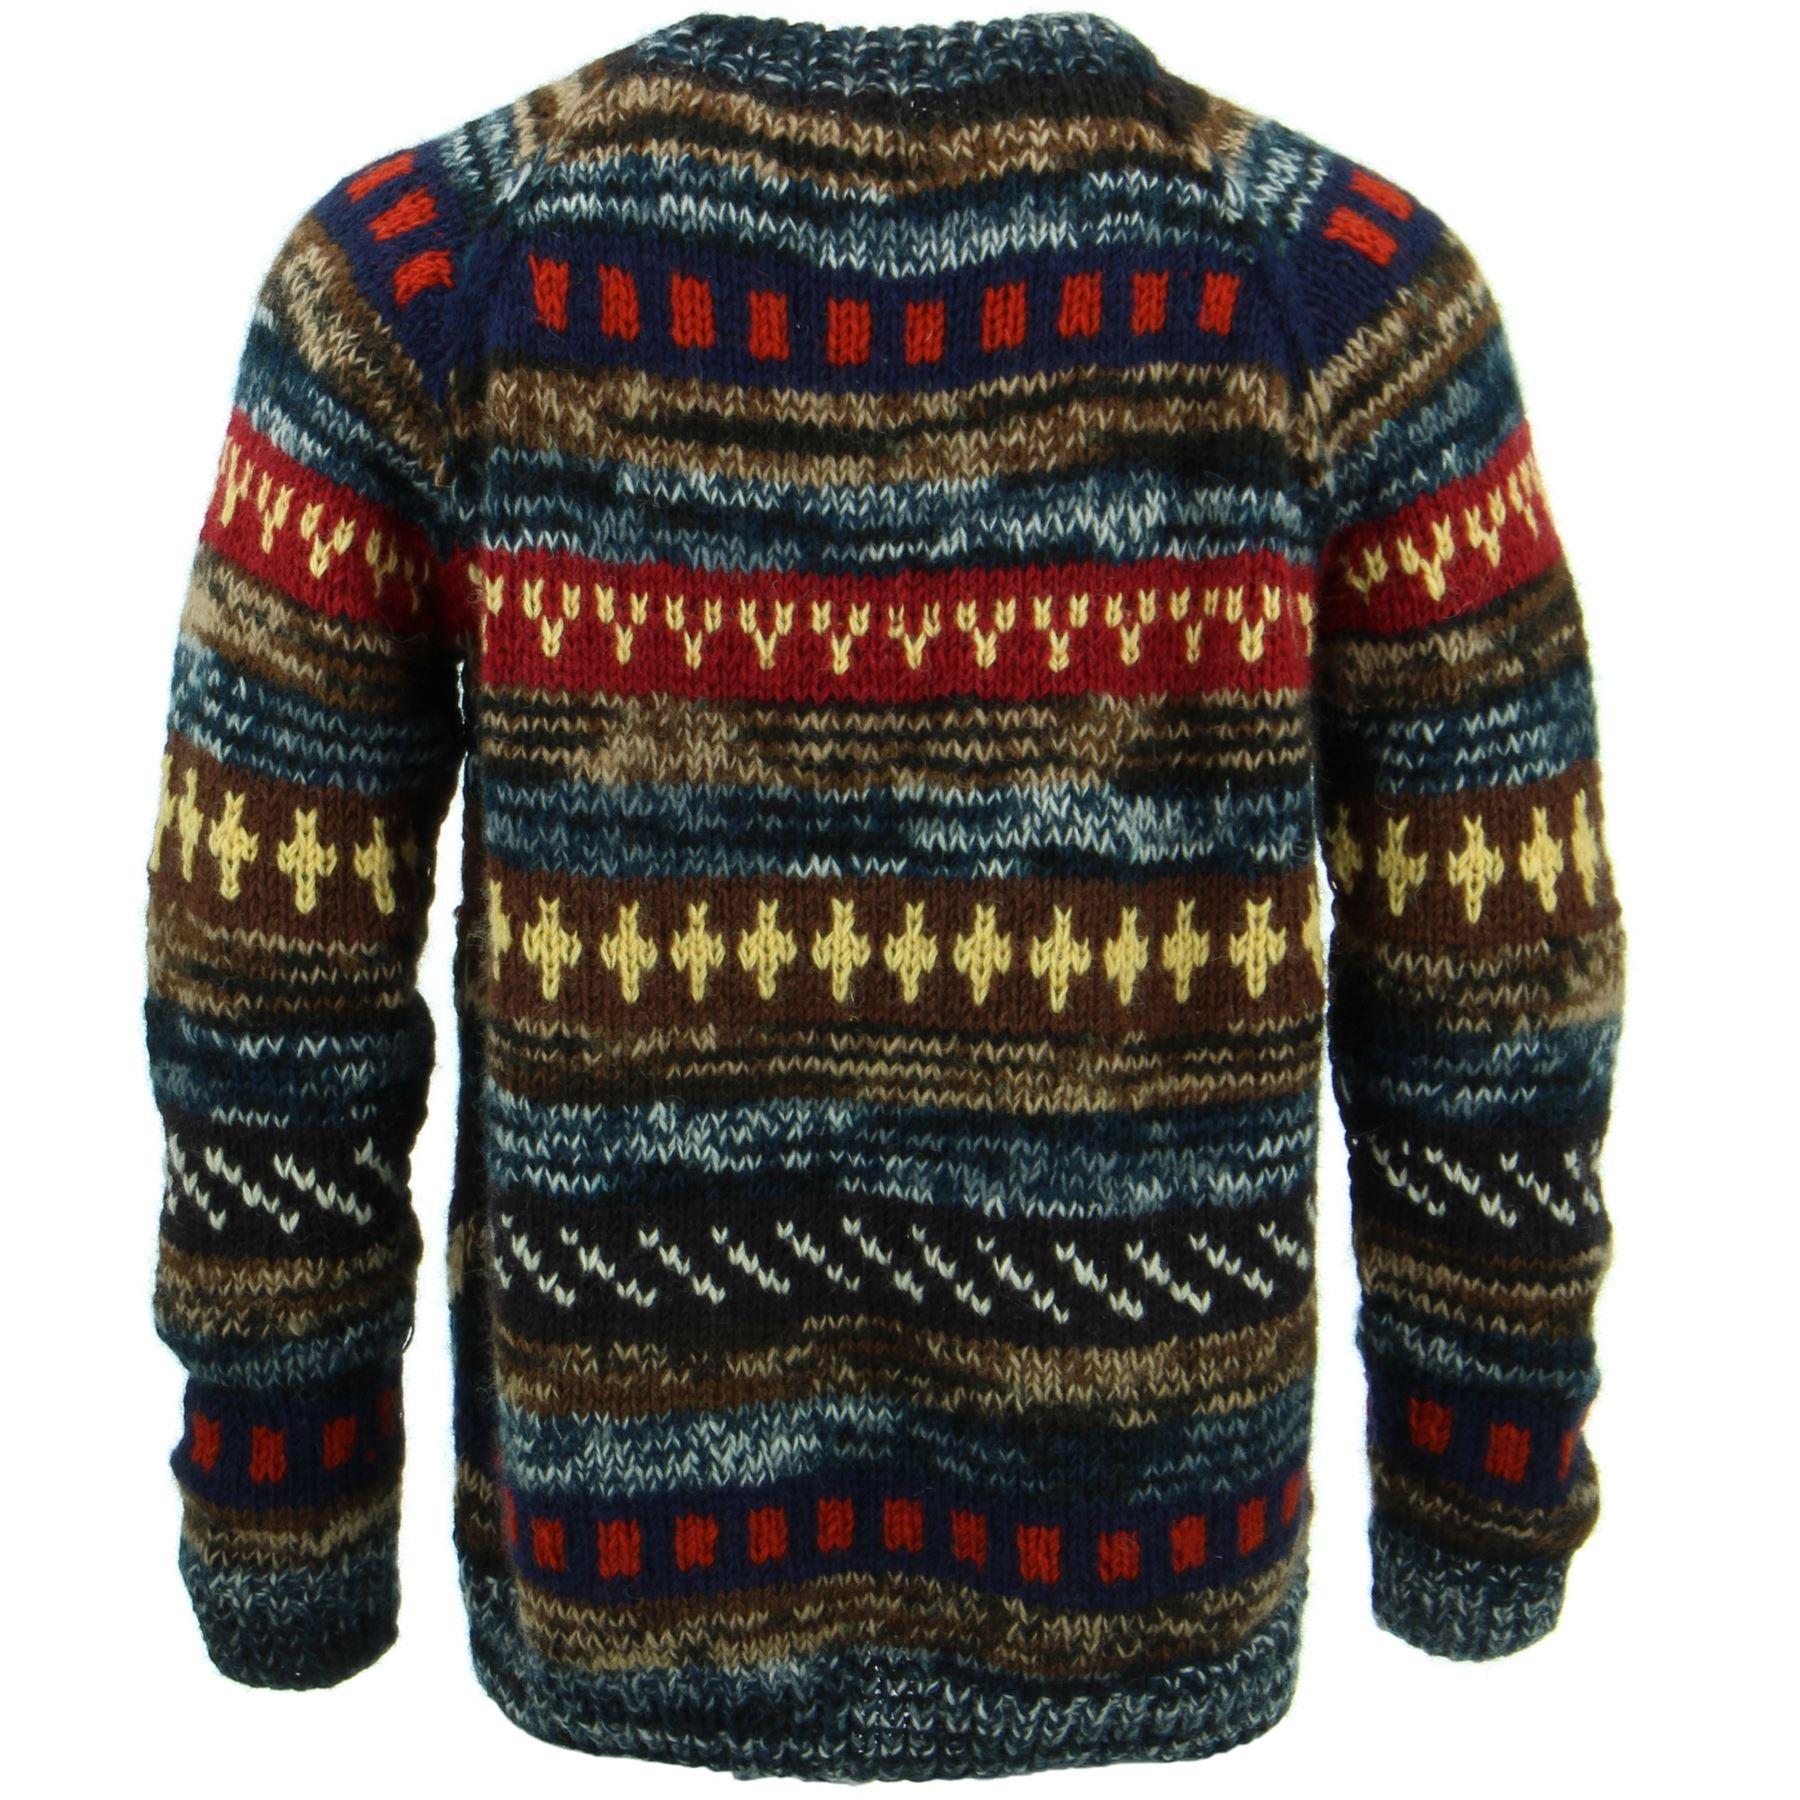 thumbnail 7 - Wool Knit Jumper Sweater Pullover Fairisle Nordic Abstract Warm Nepal Loose